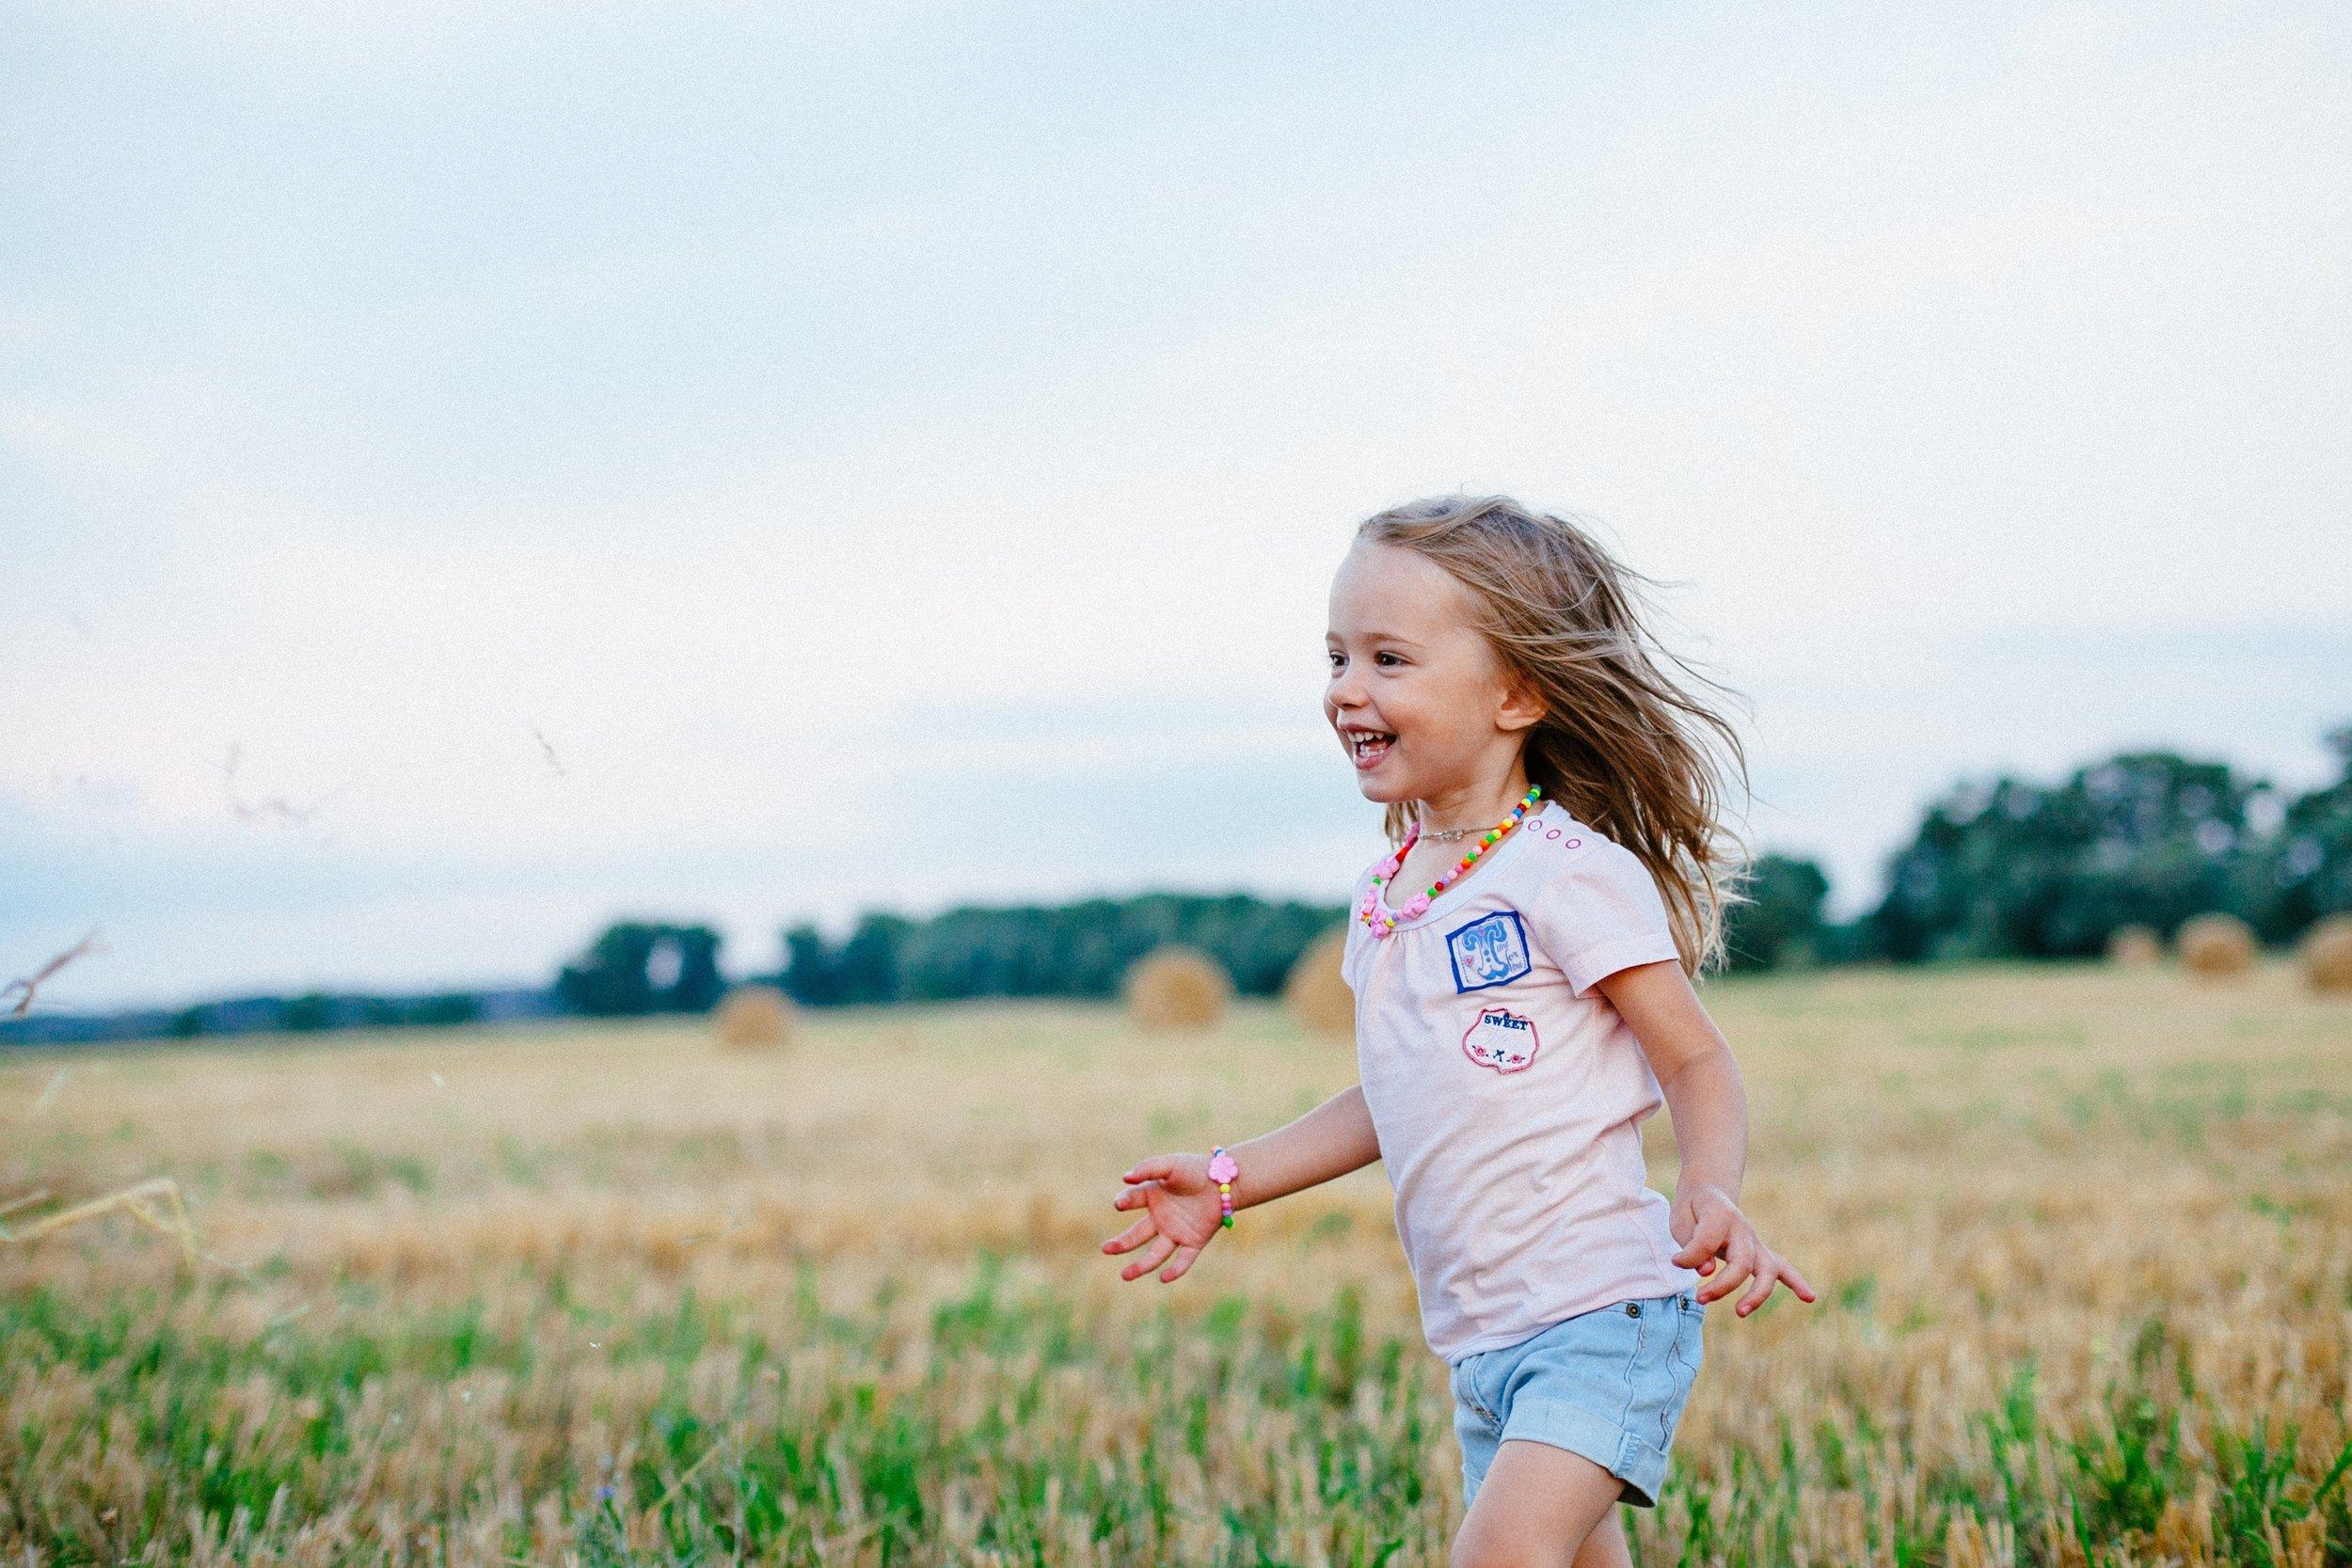 carefree-child-enjoyment-220455.jpg